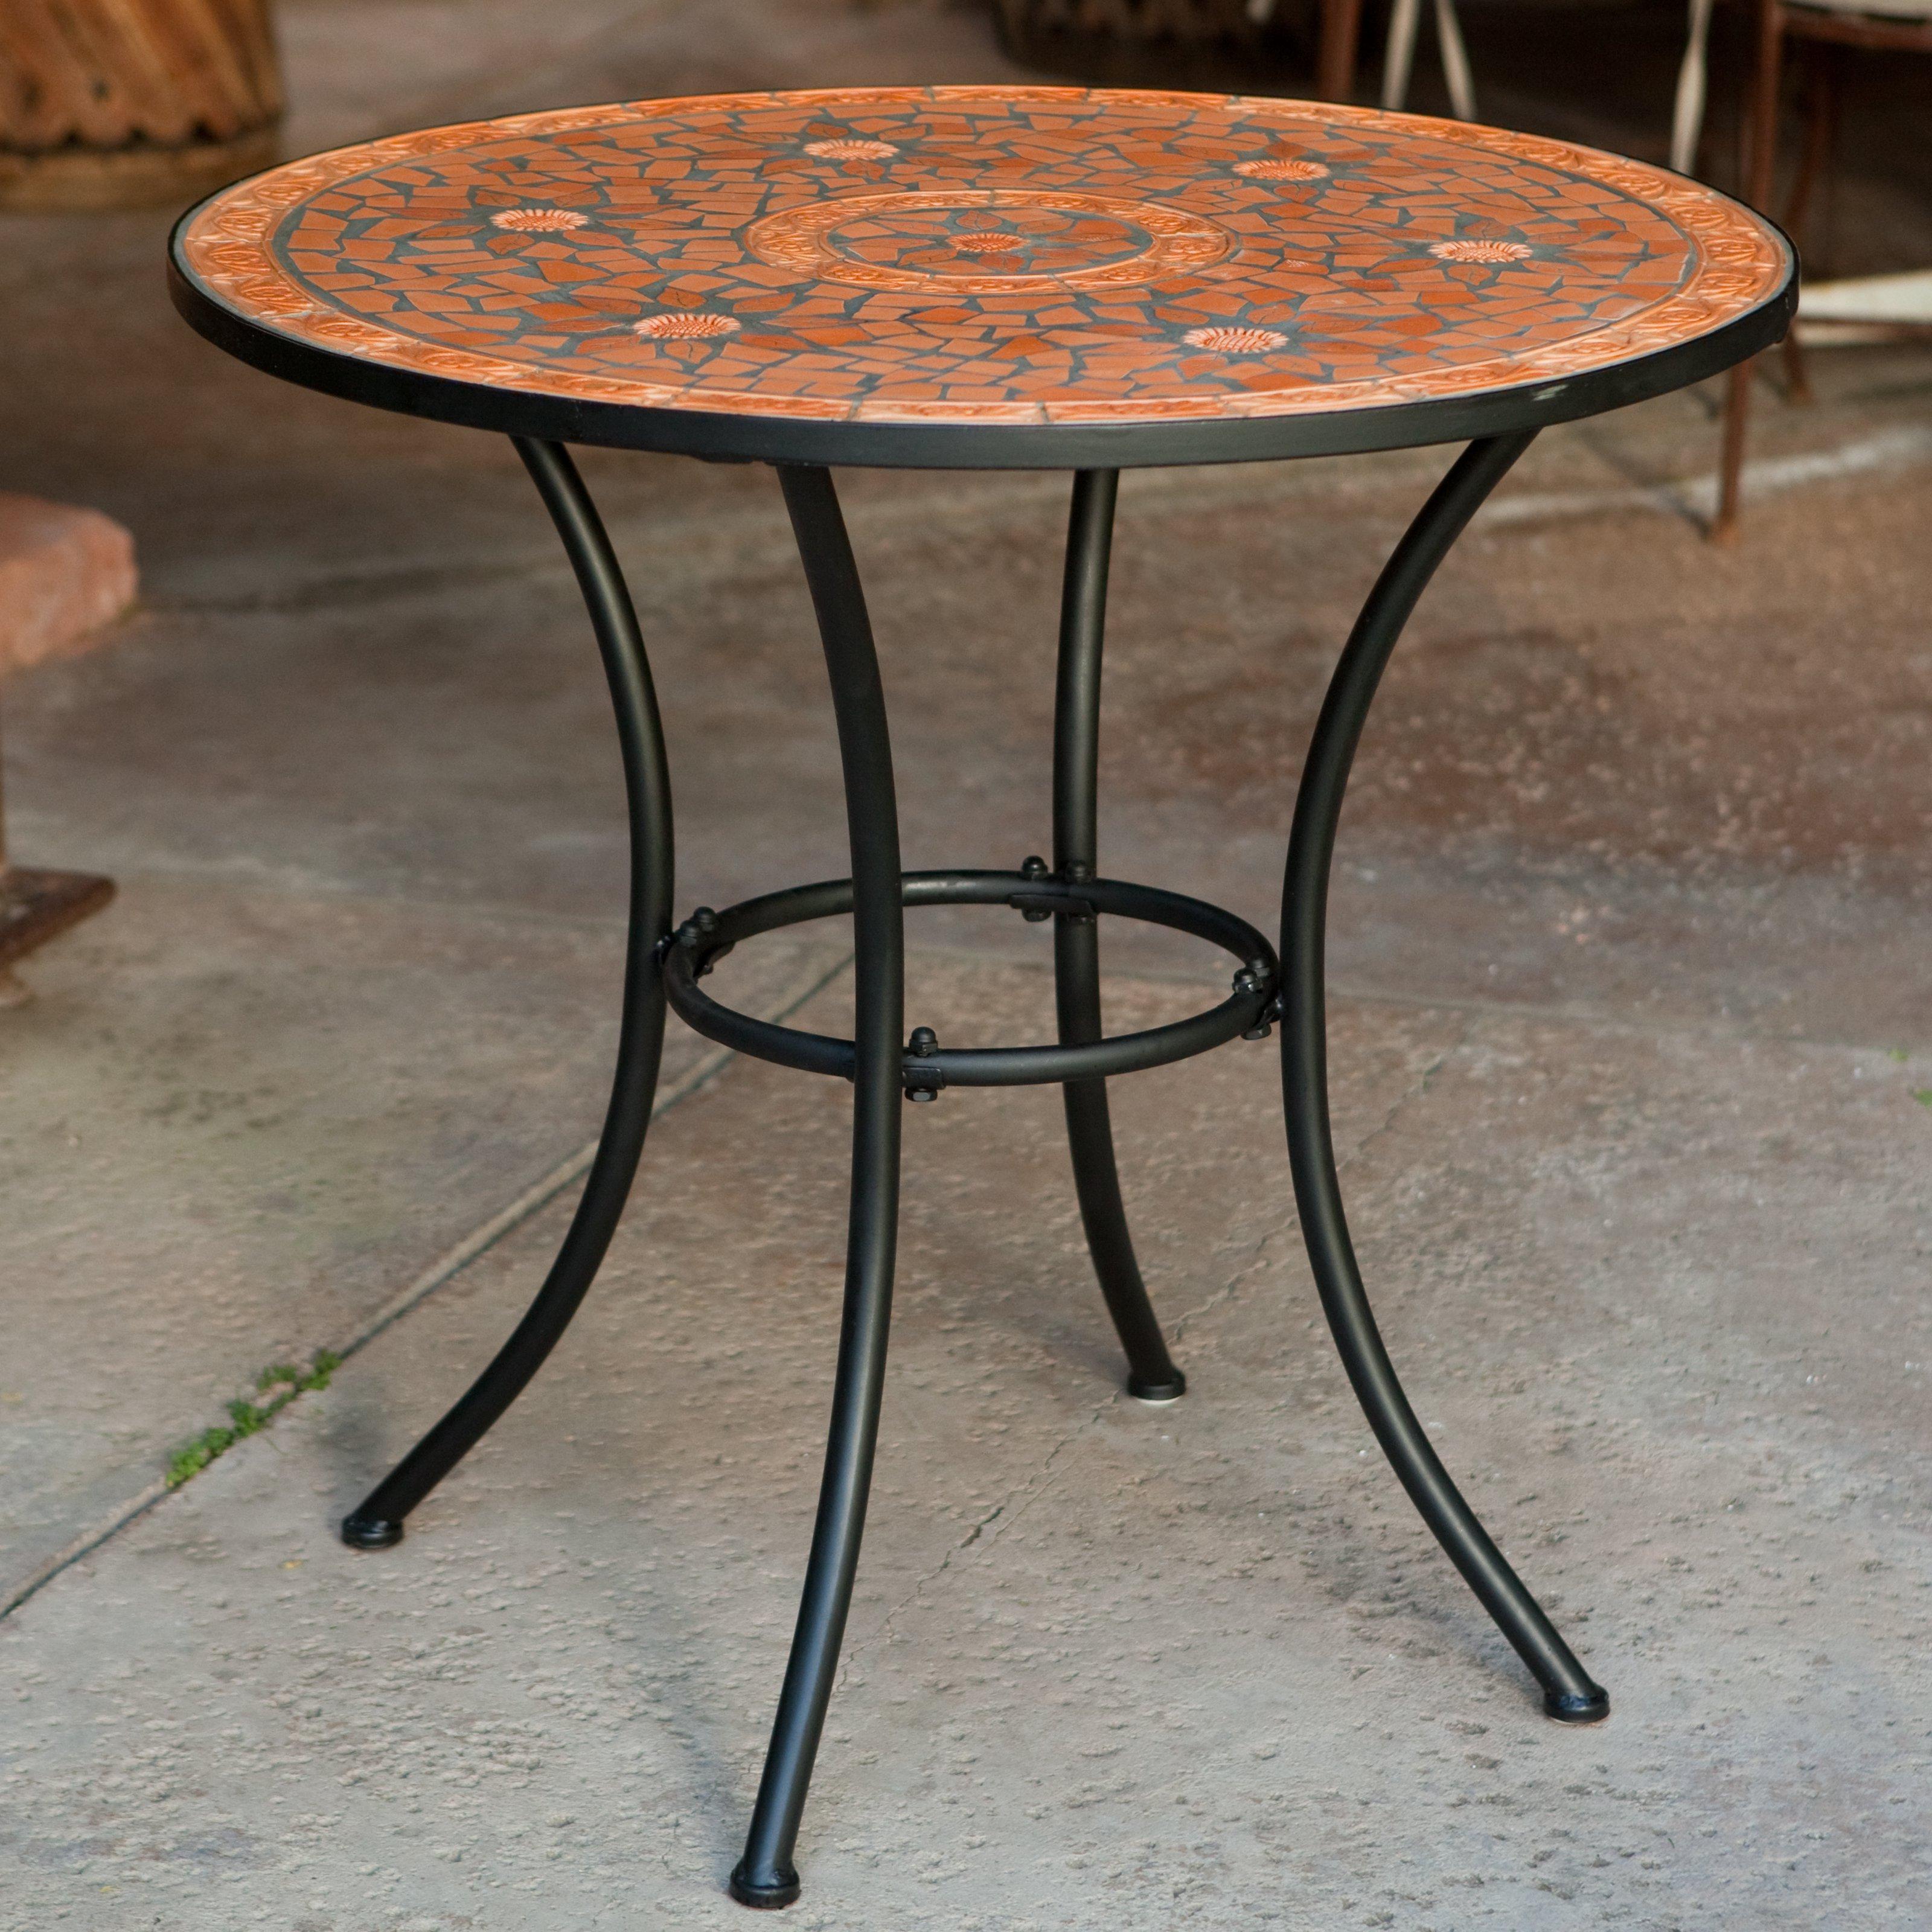 coral coast terra cotta mosaic bistro table | hayneedle PIWLNKH